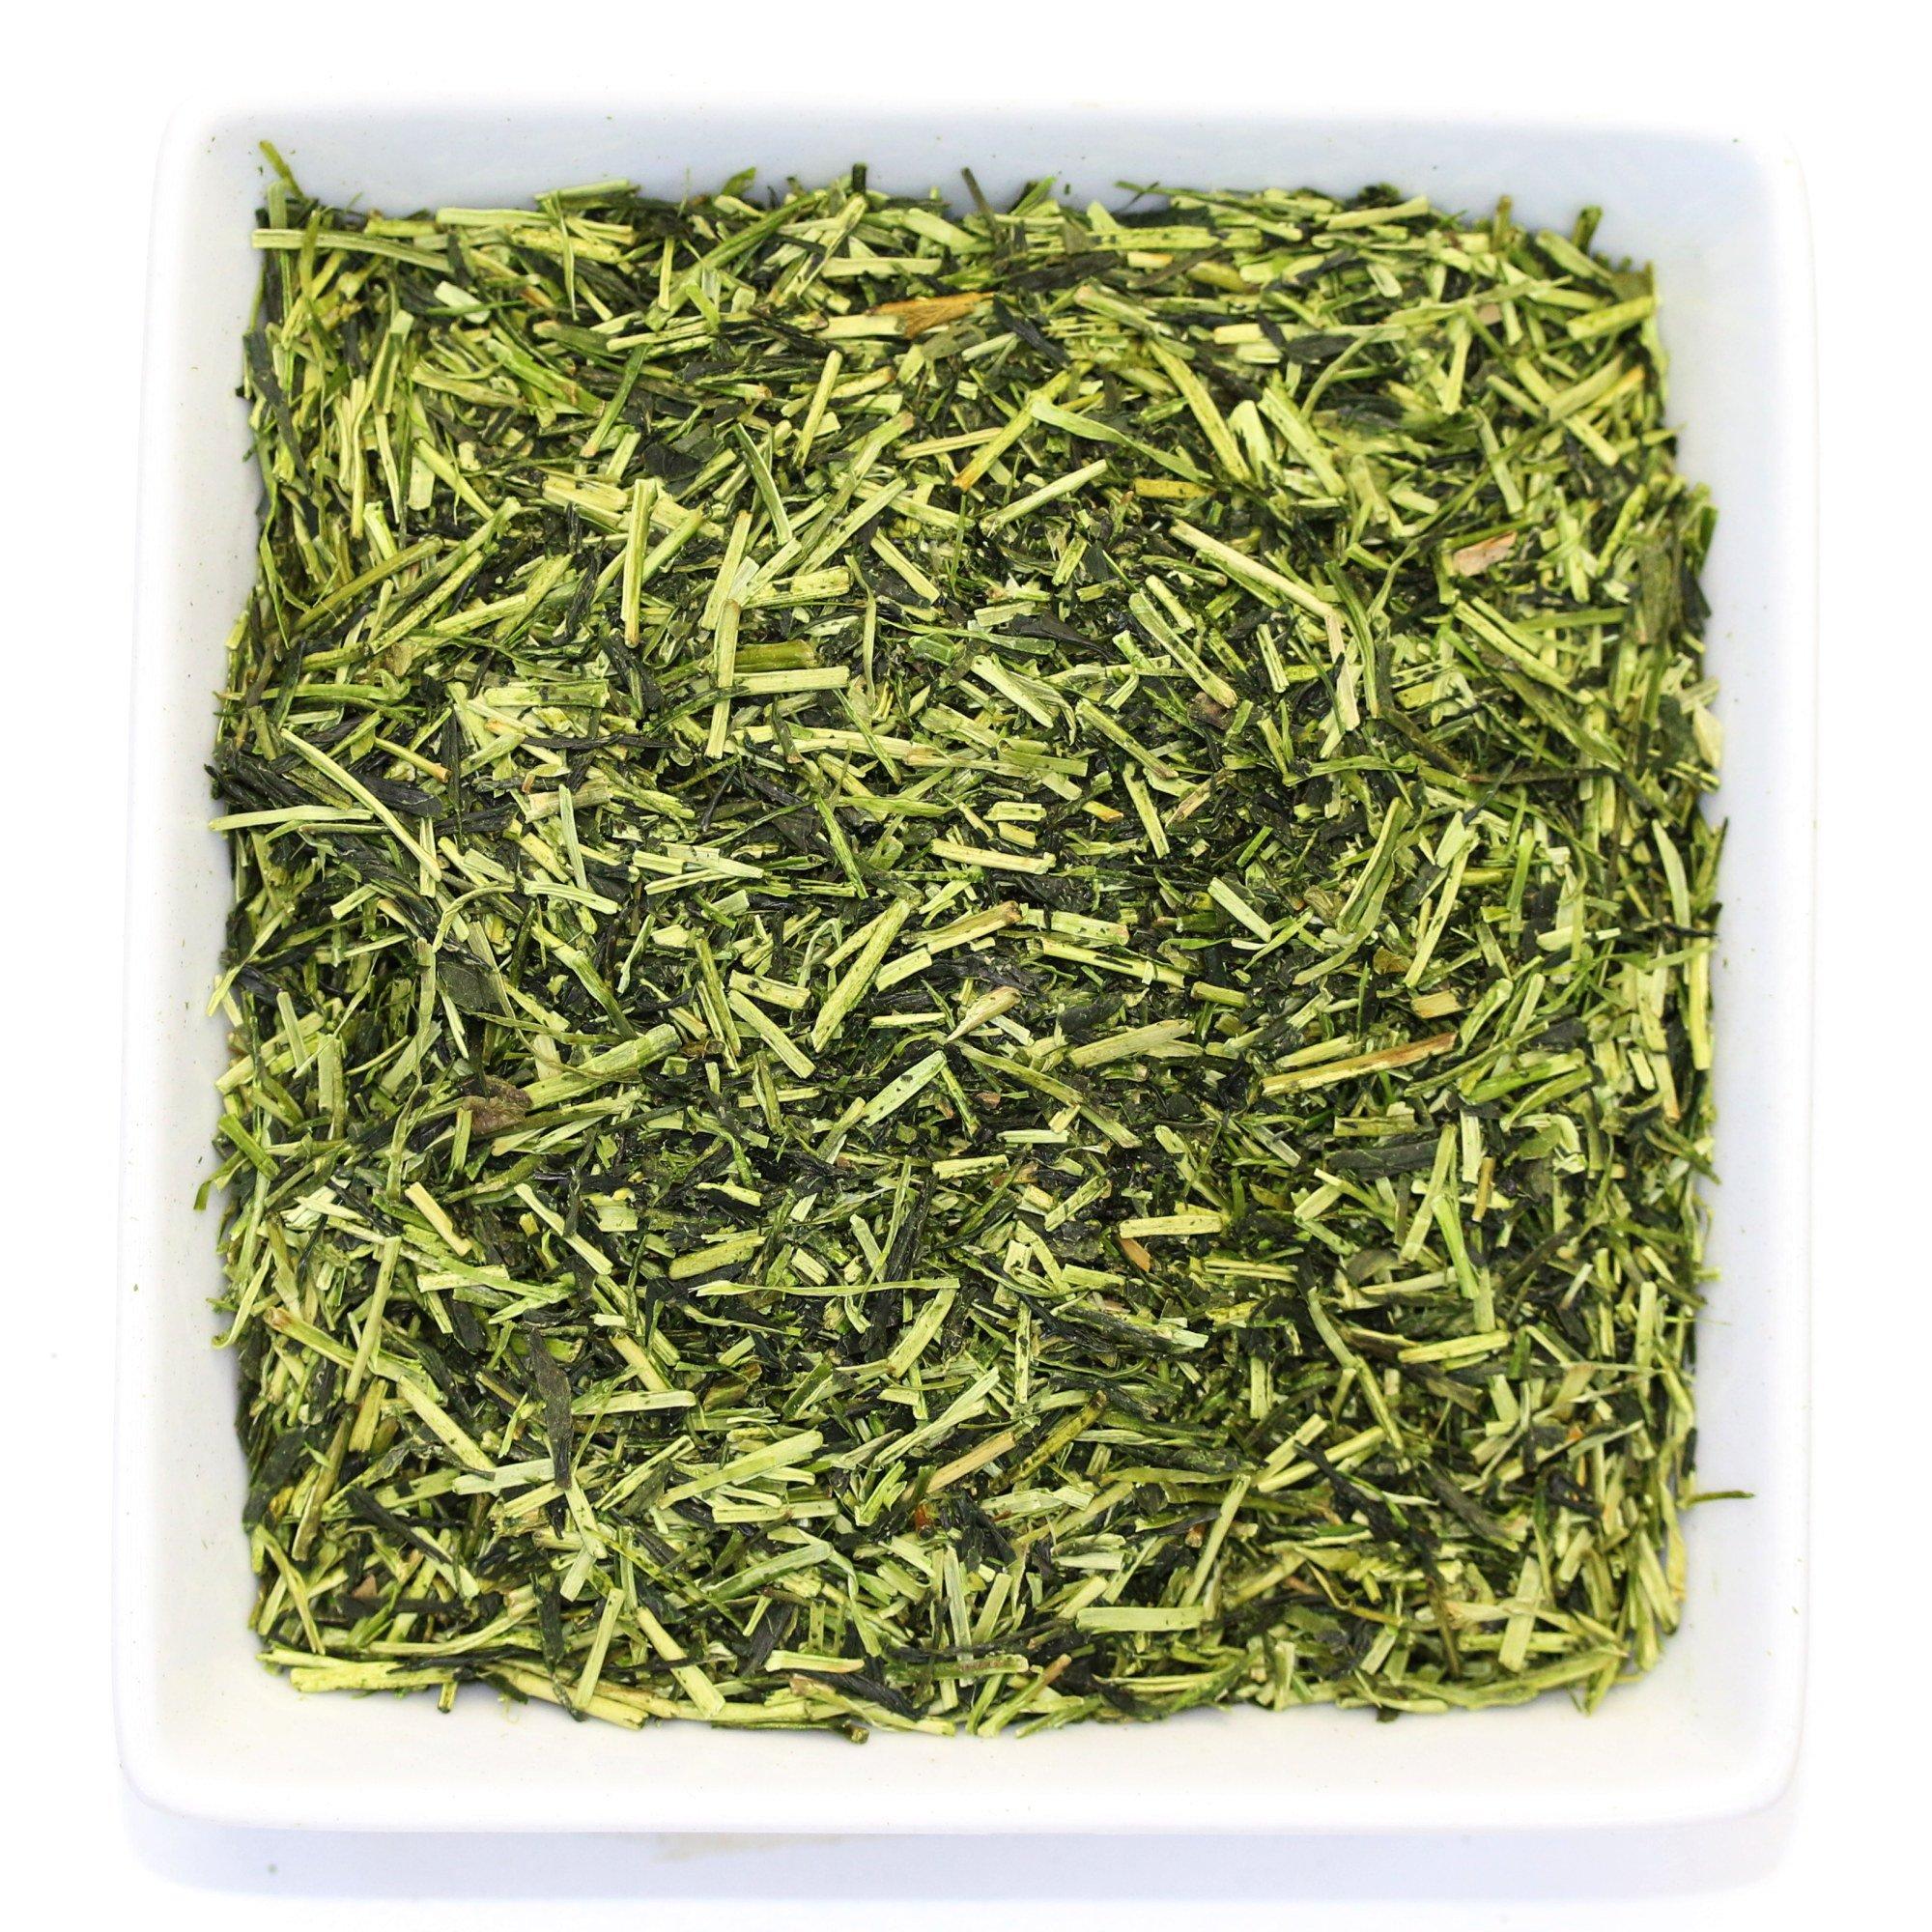 Tealyra - Premium Kukicha Twig Kabuse - Japanese Green tea - Organically Grown - Loose Leaf Tea - Mild Slightly Nutty Flavour - High Level of Antioxidants - Caffeine Level Low - 100g